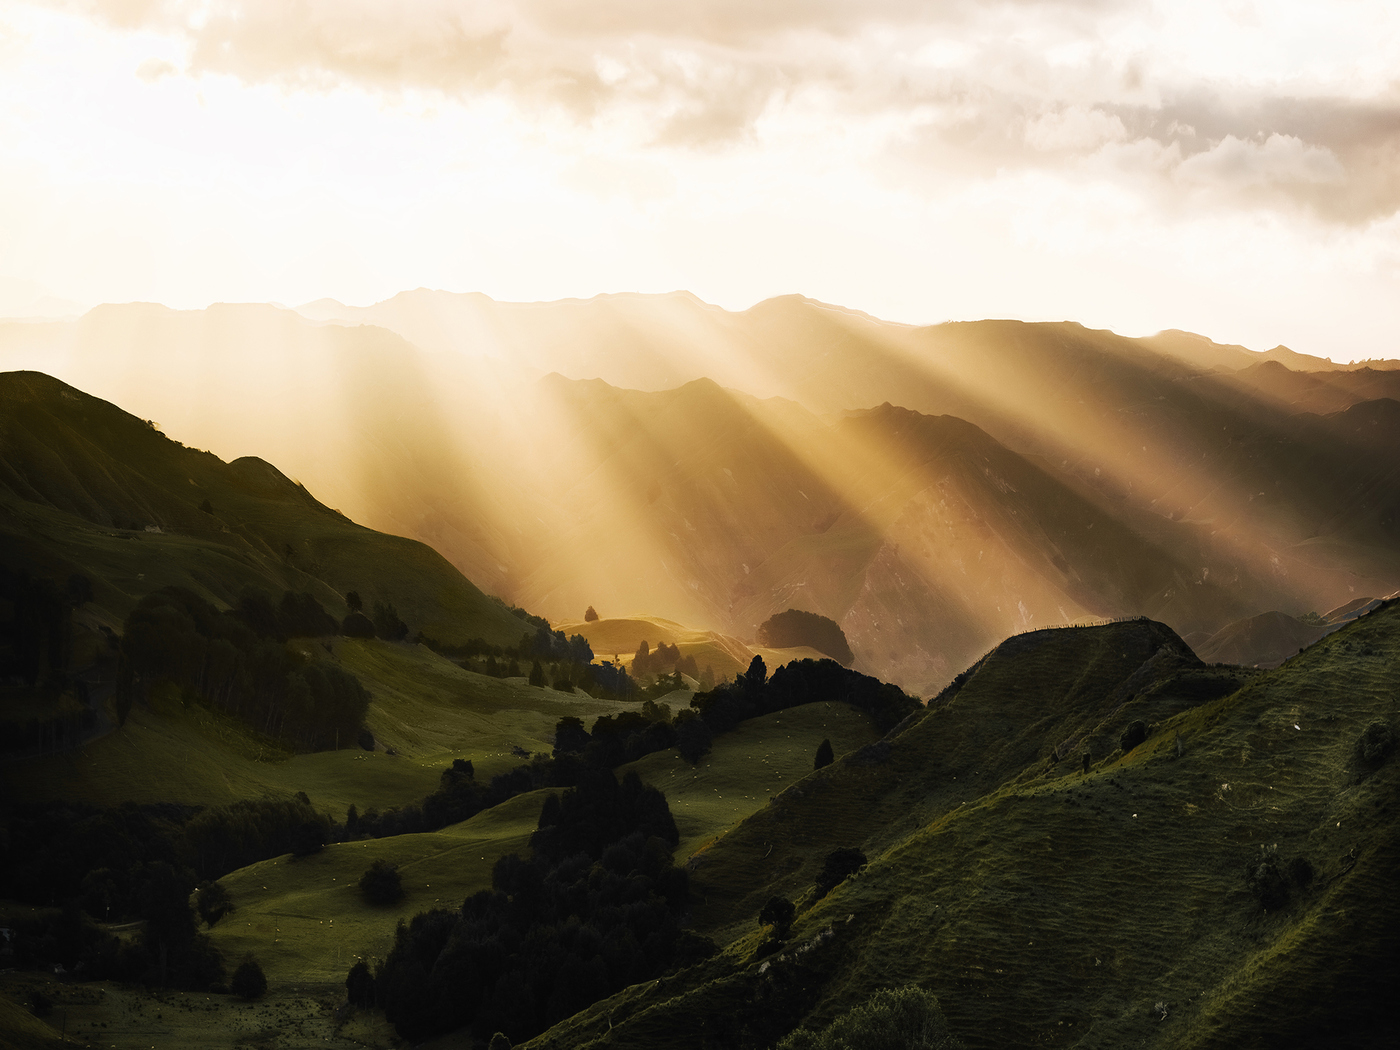 sunbeams-morning-mountains-u2.jpg